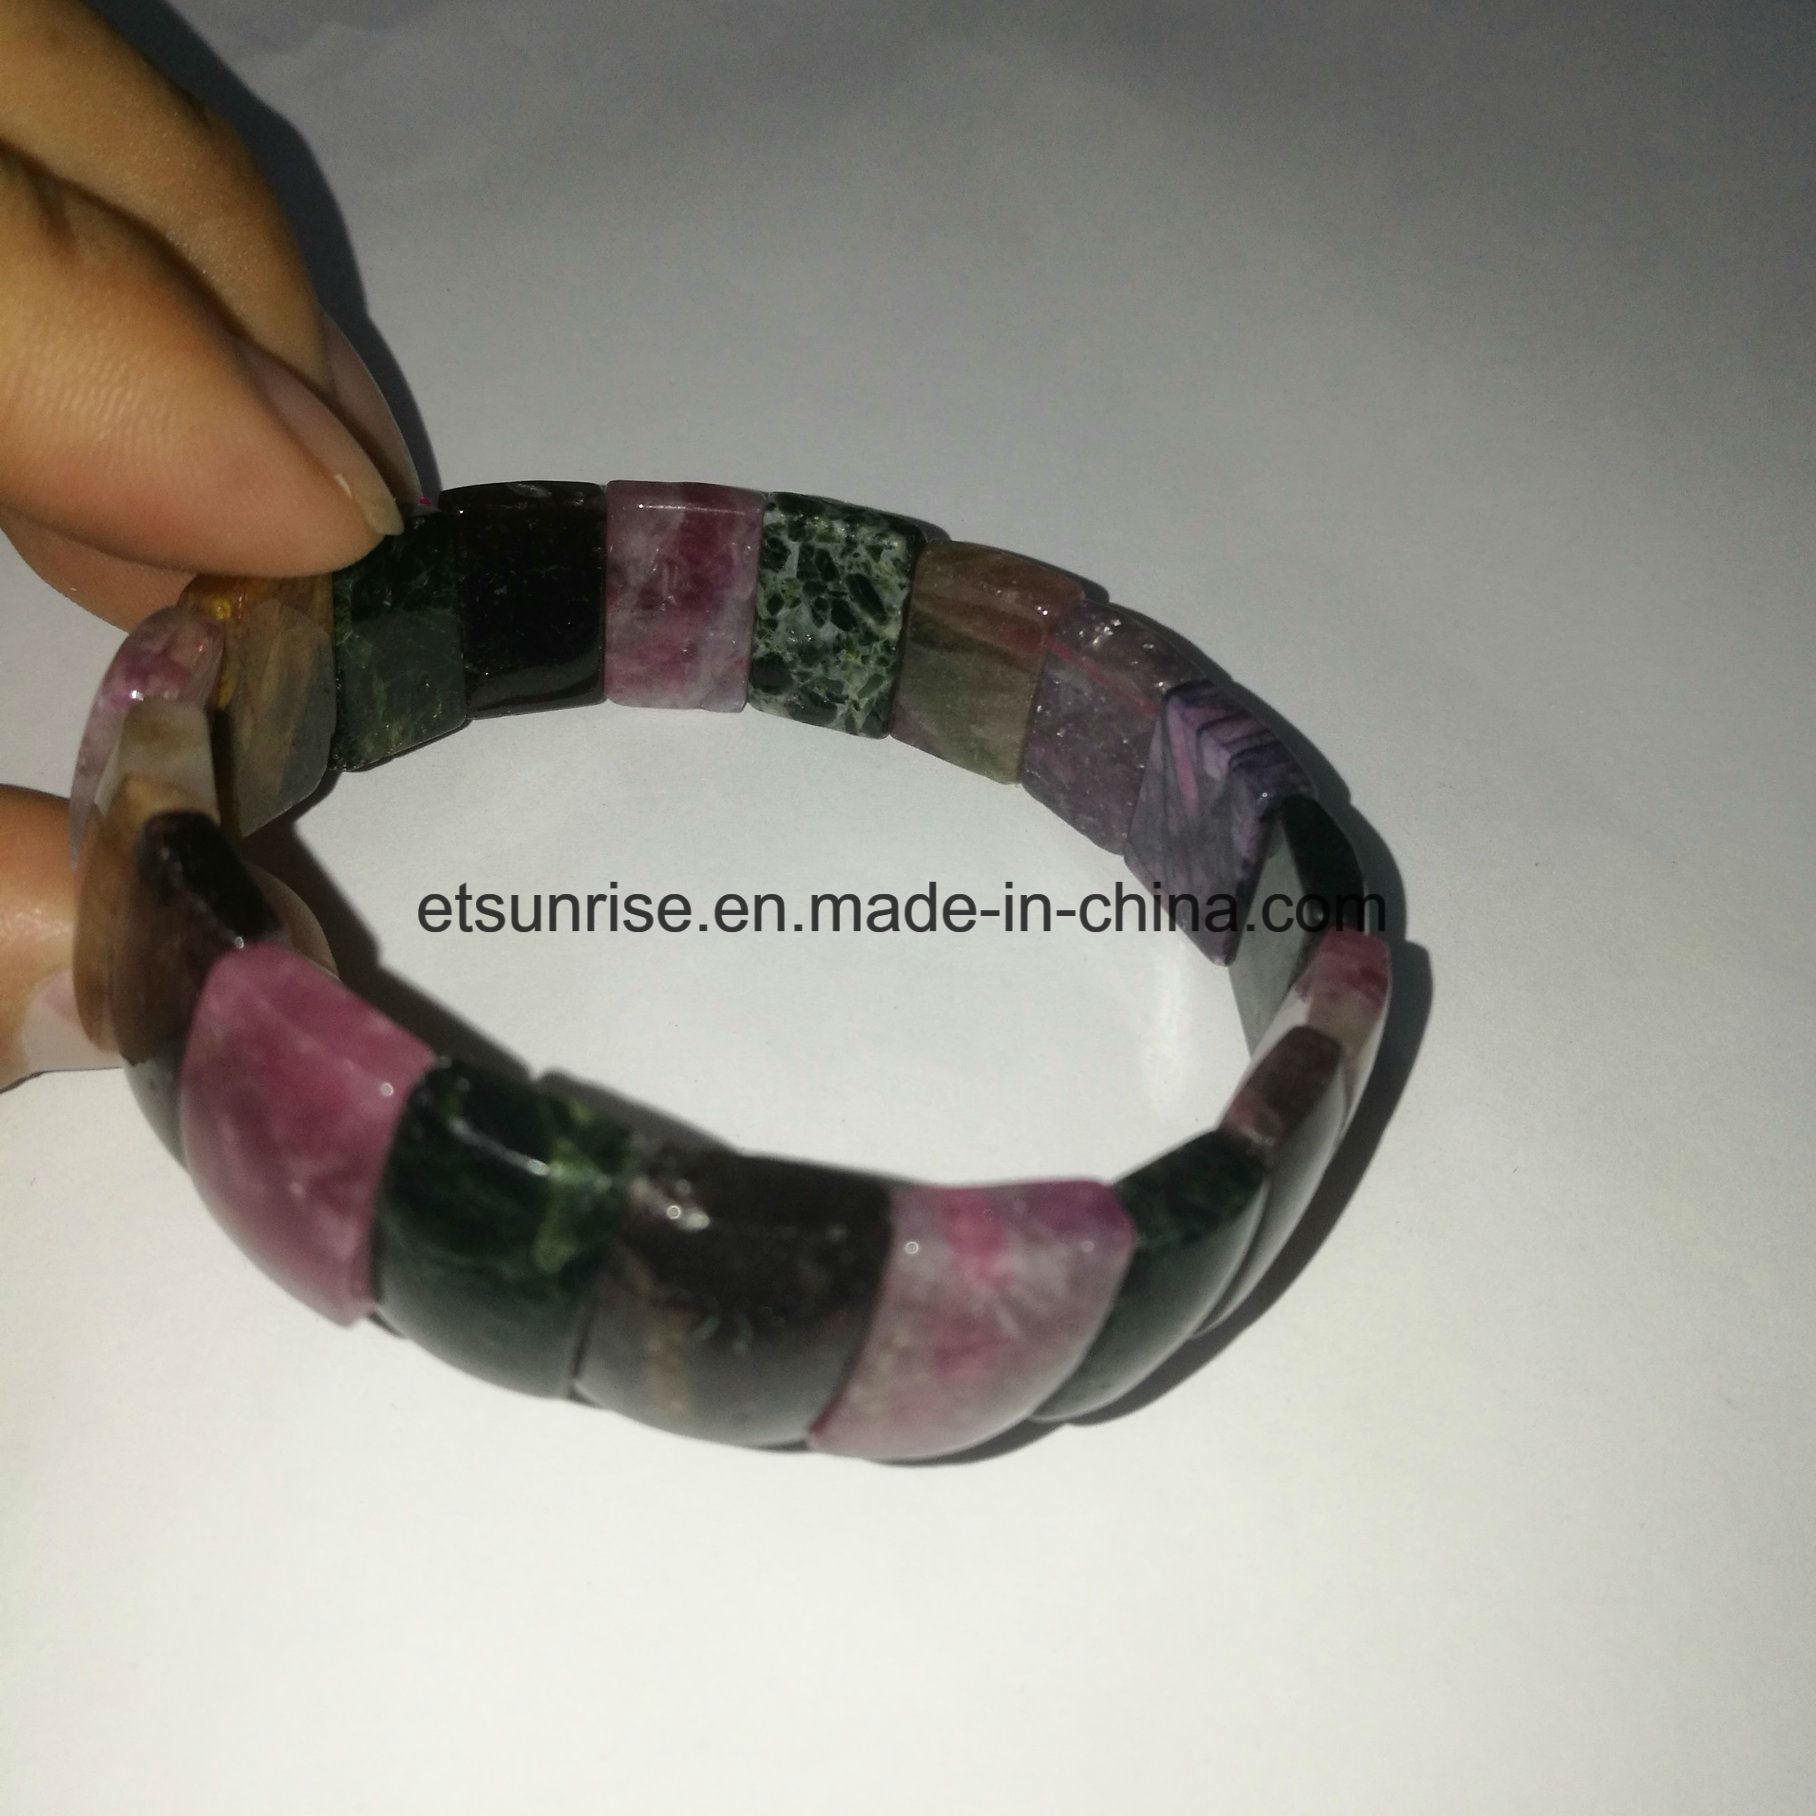 China Semi Precious Stone Tourmaline Natural Crystal Quartz Bracelet